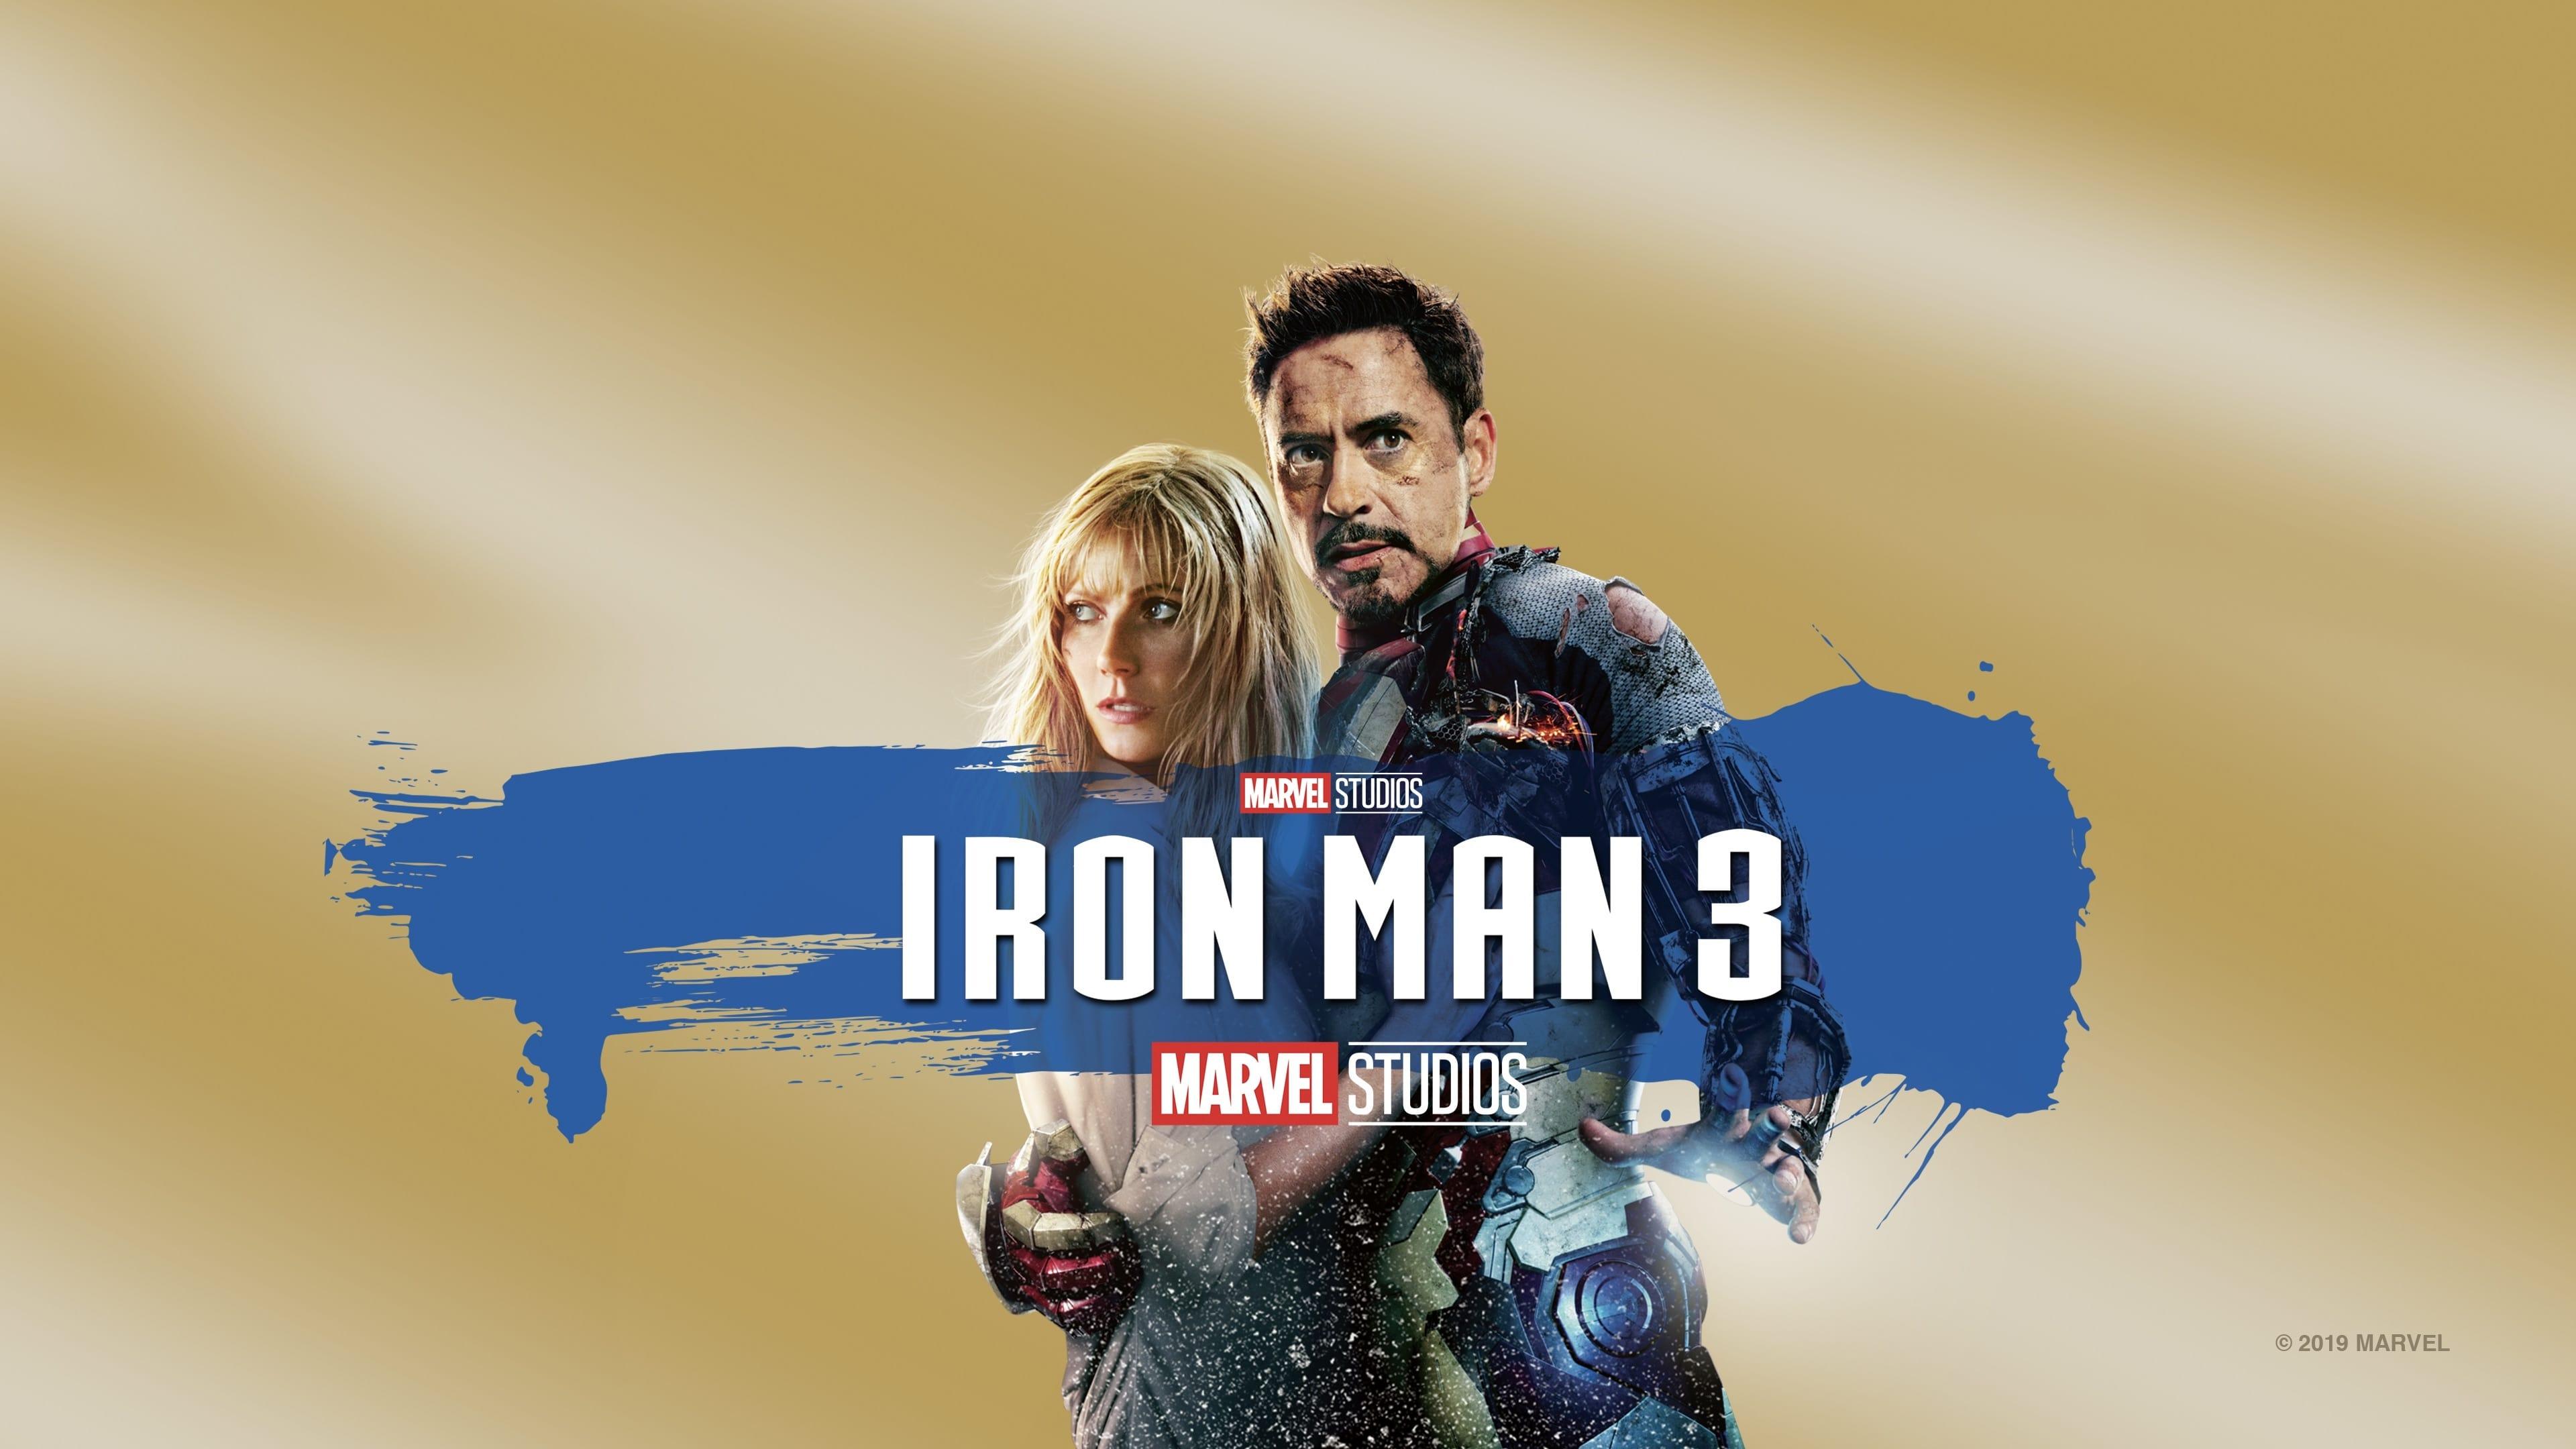 Gwyneth Paltrow Iron Man Iron Man 3 Pepper Potts Robert Downey Jr Tony Stark 3840x2160